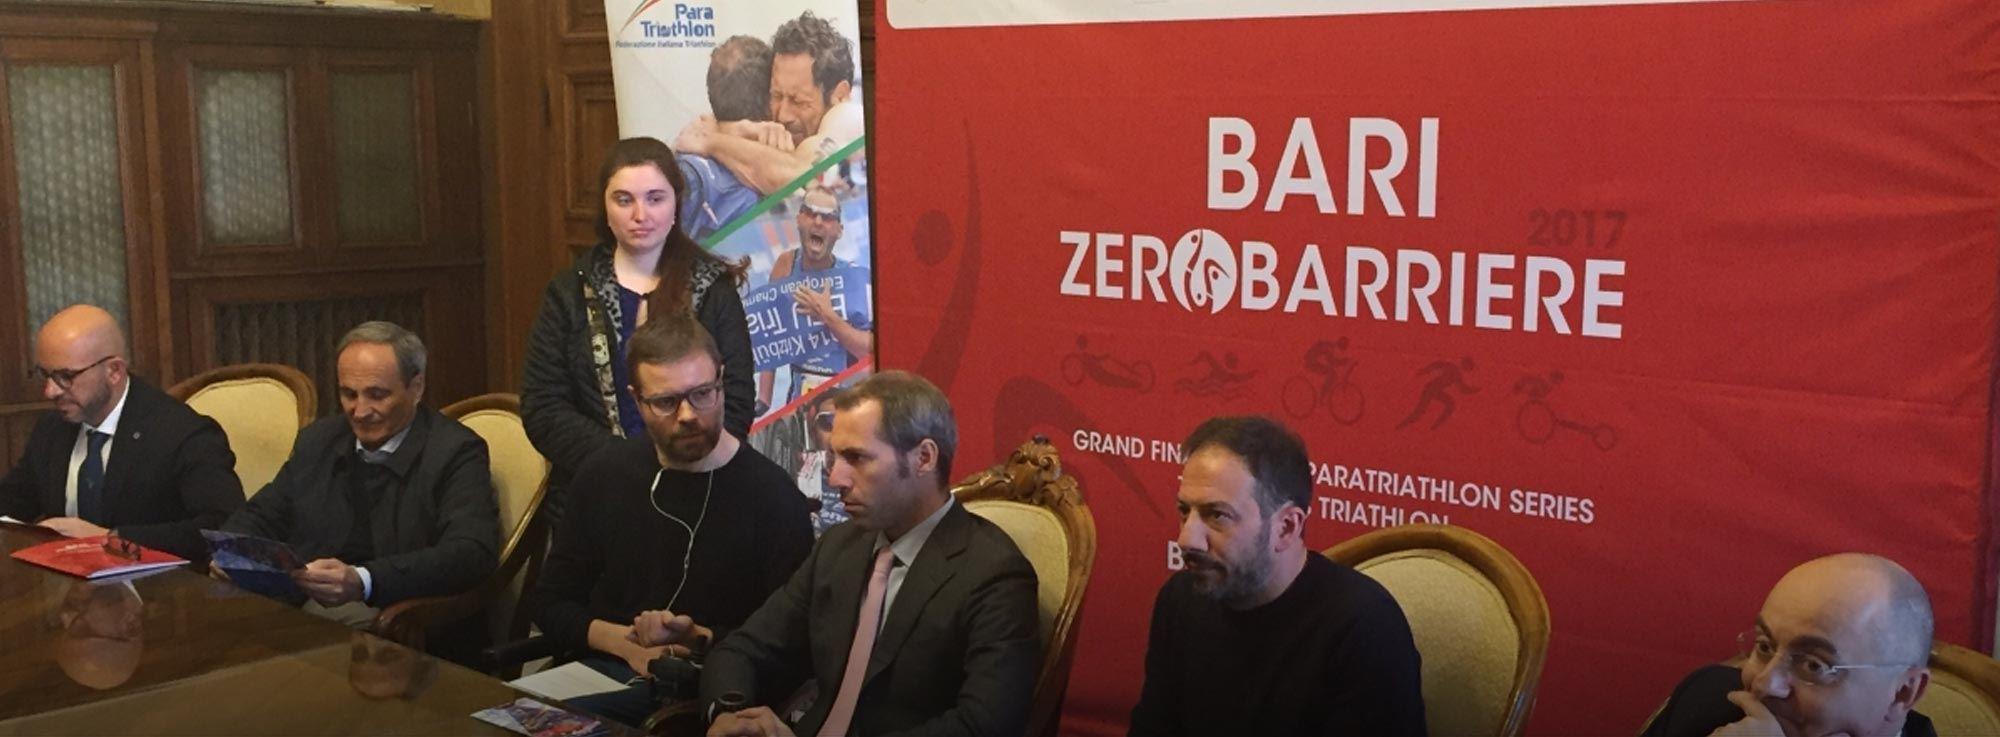 Bari: Bari Zerobarriere